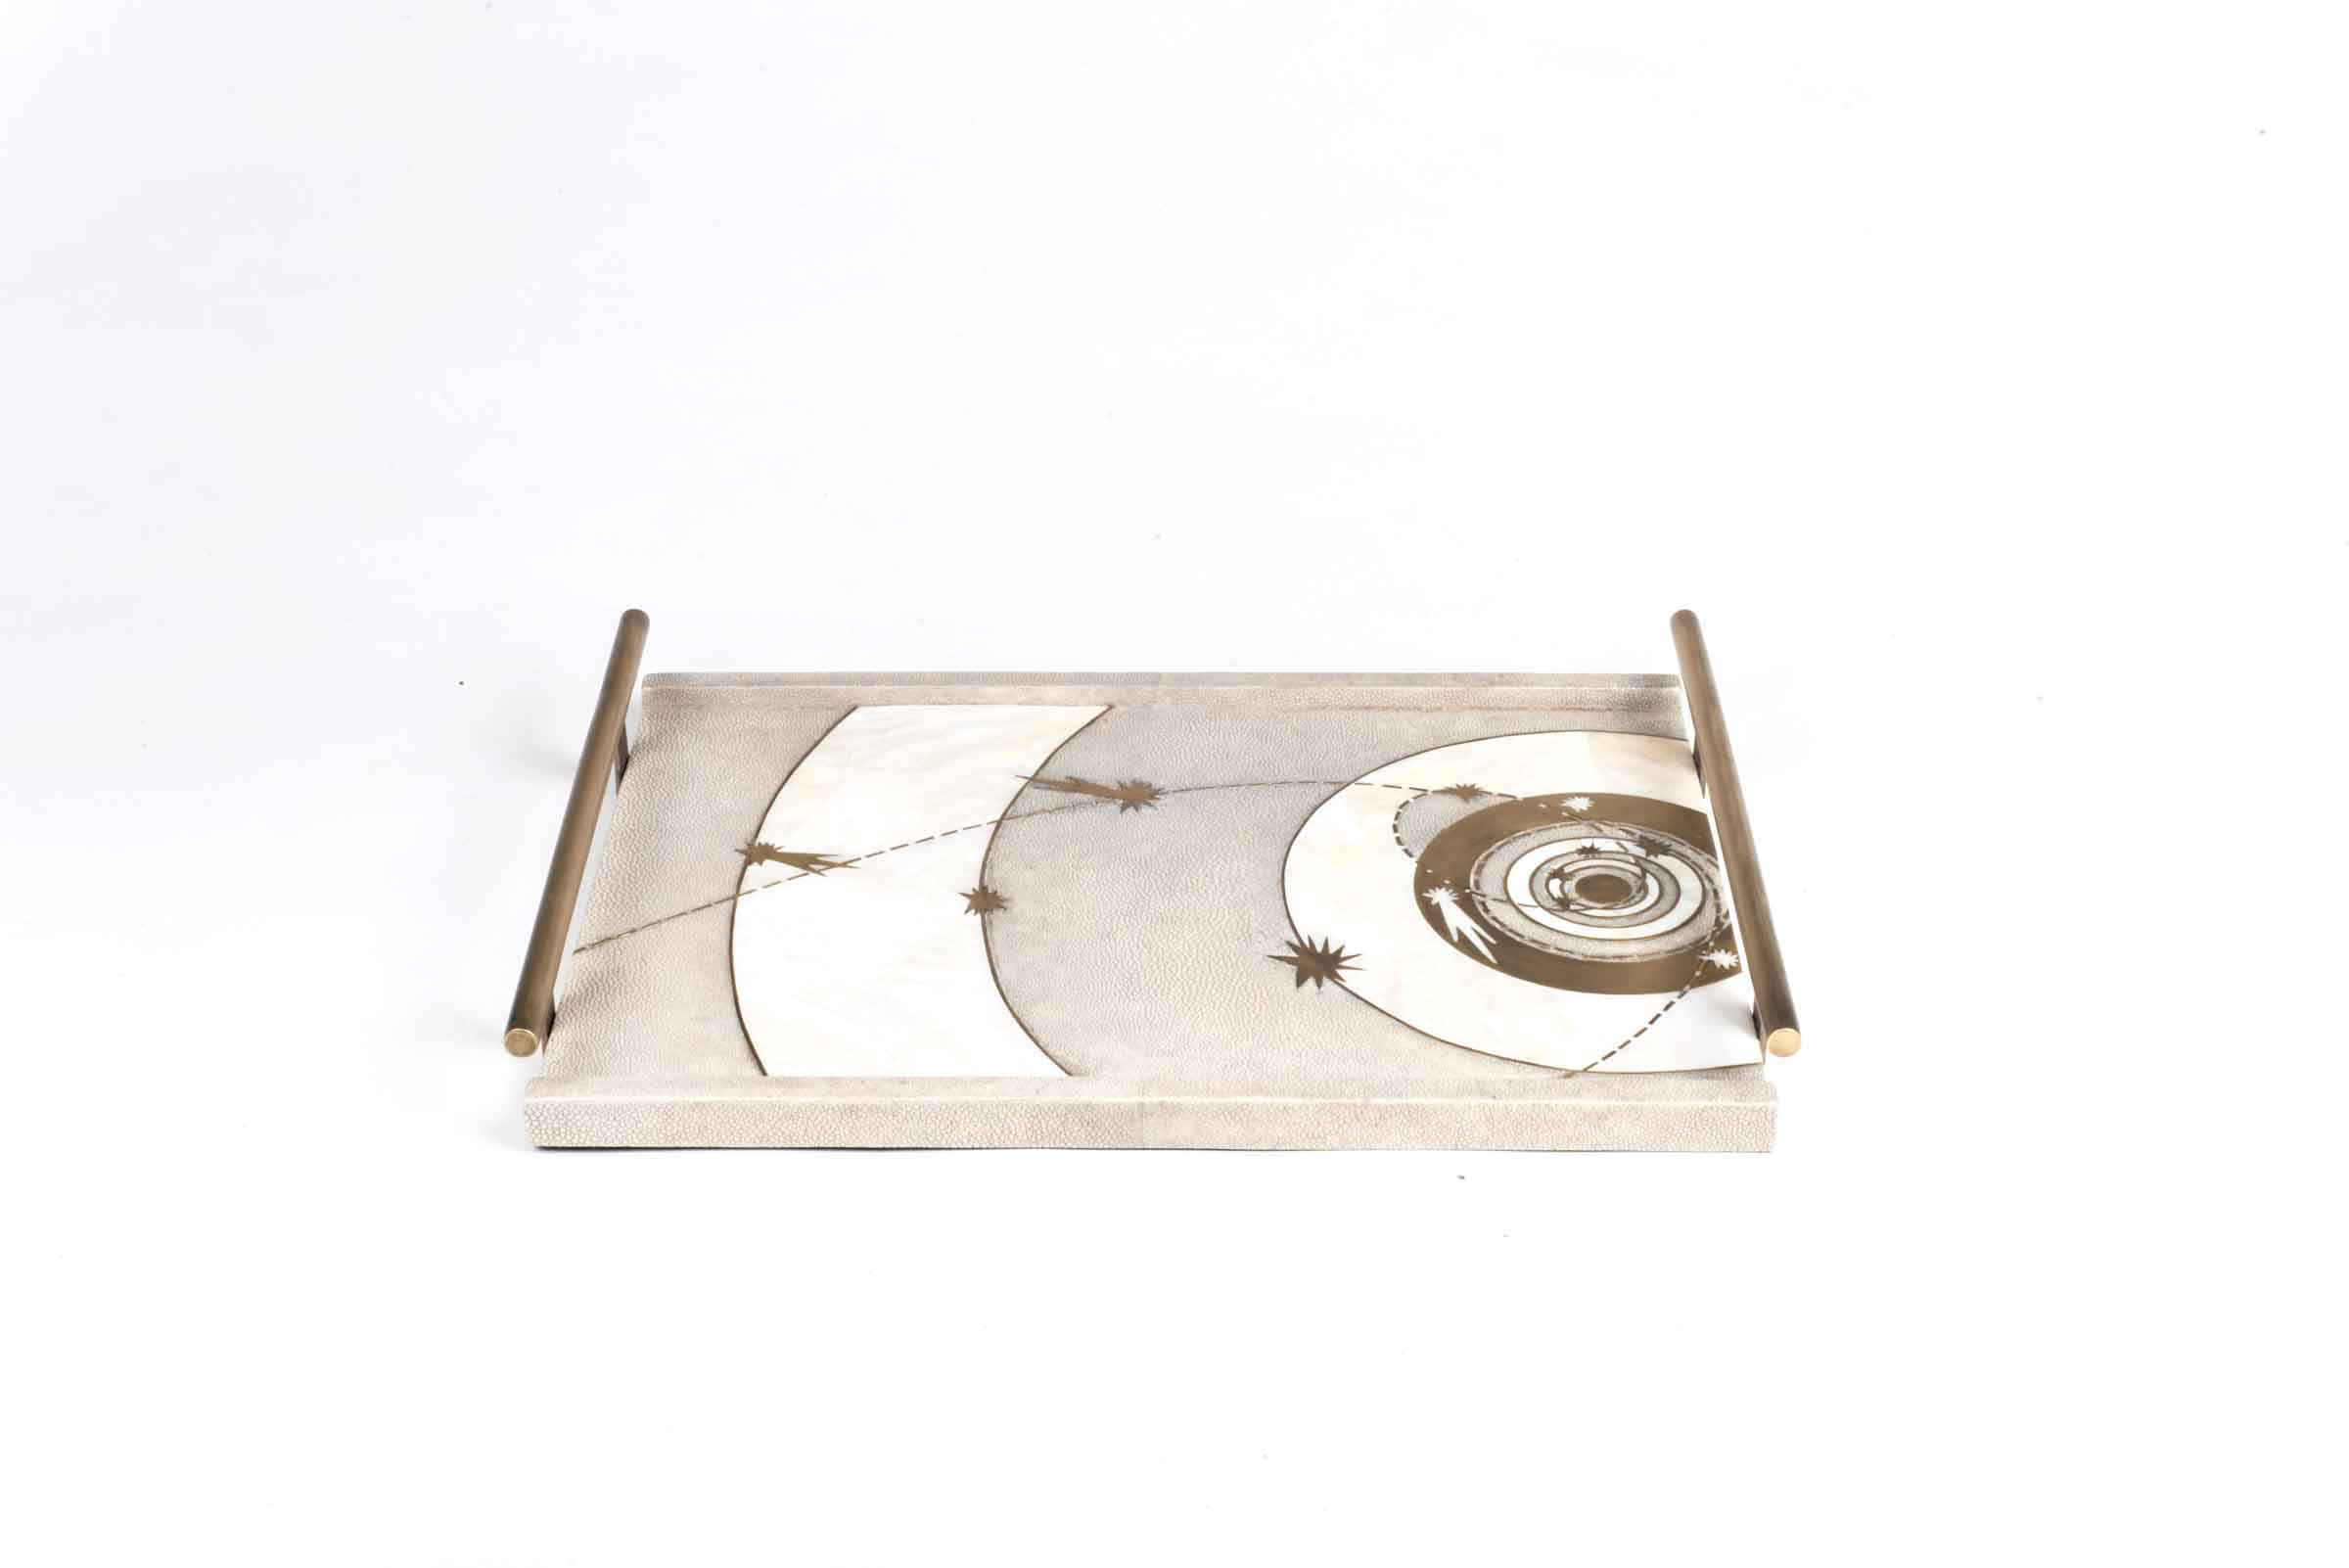 KTS07M-D148LT-V4-Product-shop-Kifu-Paris-Texture-Shagreen-Shell-Interior-Tabletop=Decor-Accesories-Furniture.jpg